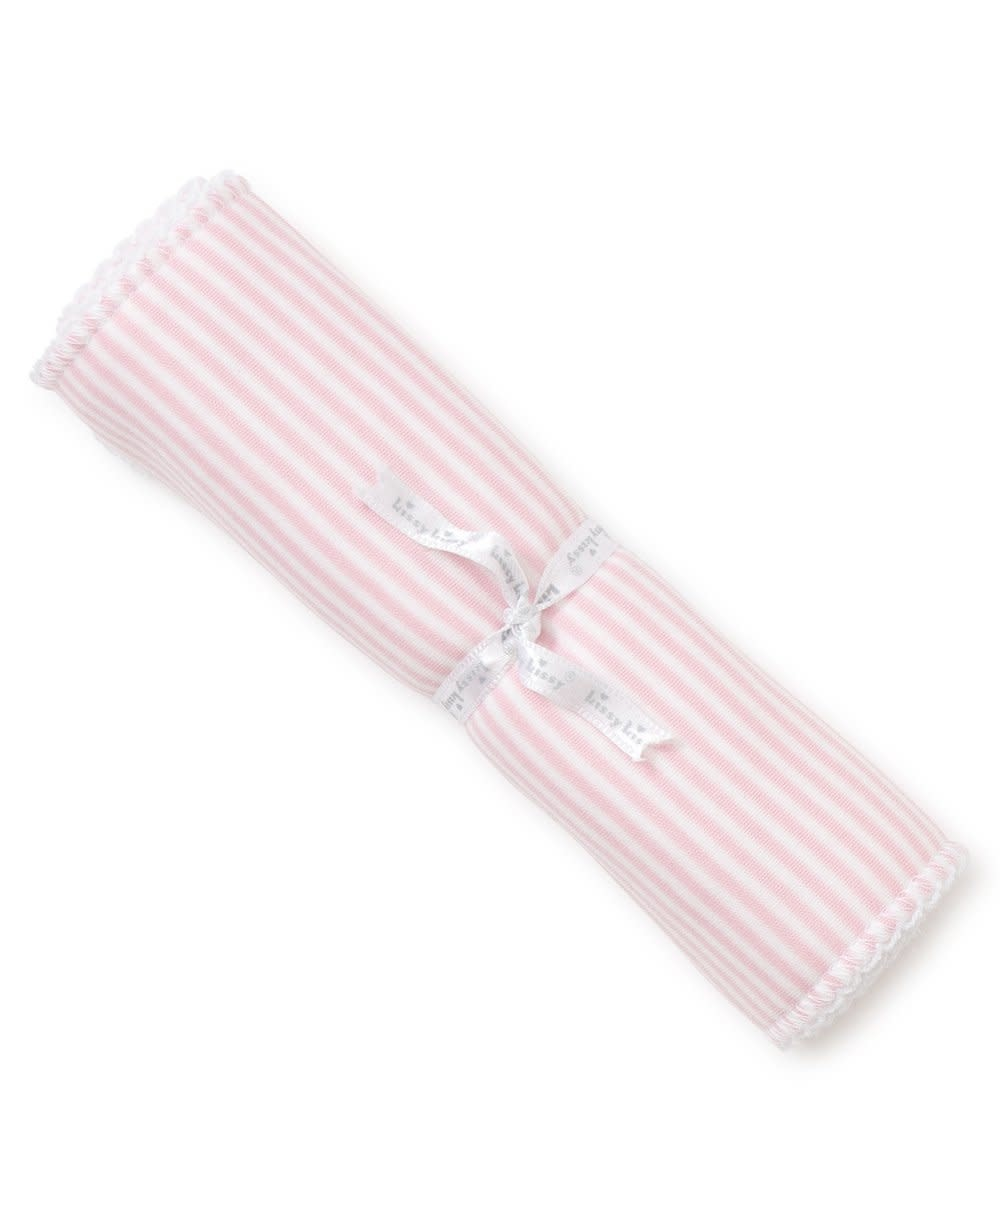 Kissy Kissy Simple Stripes Burp Cloth